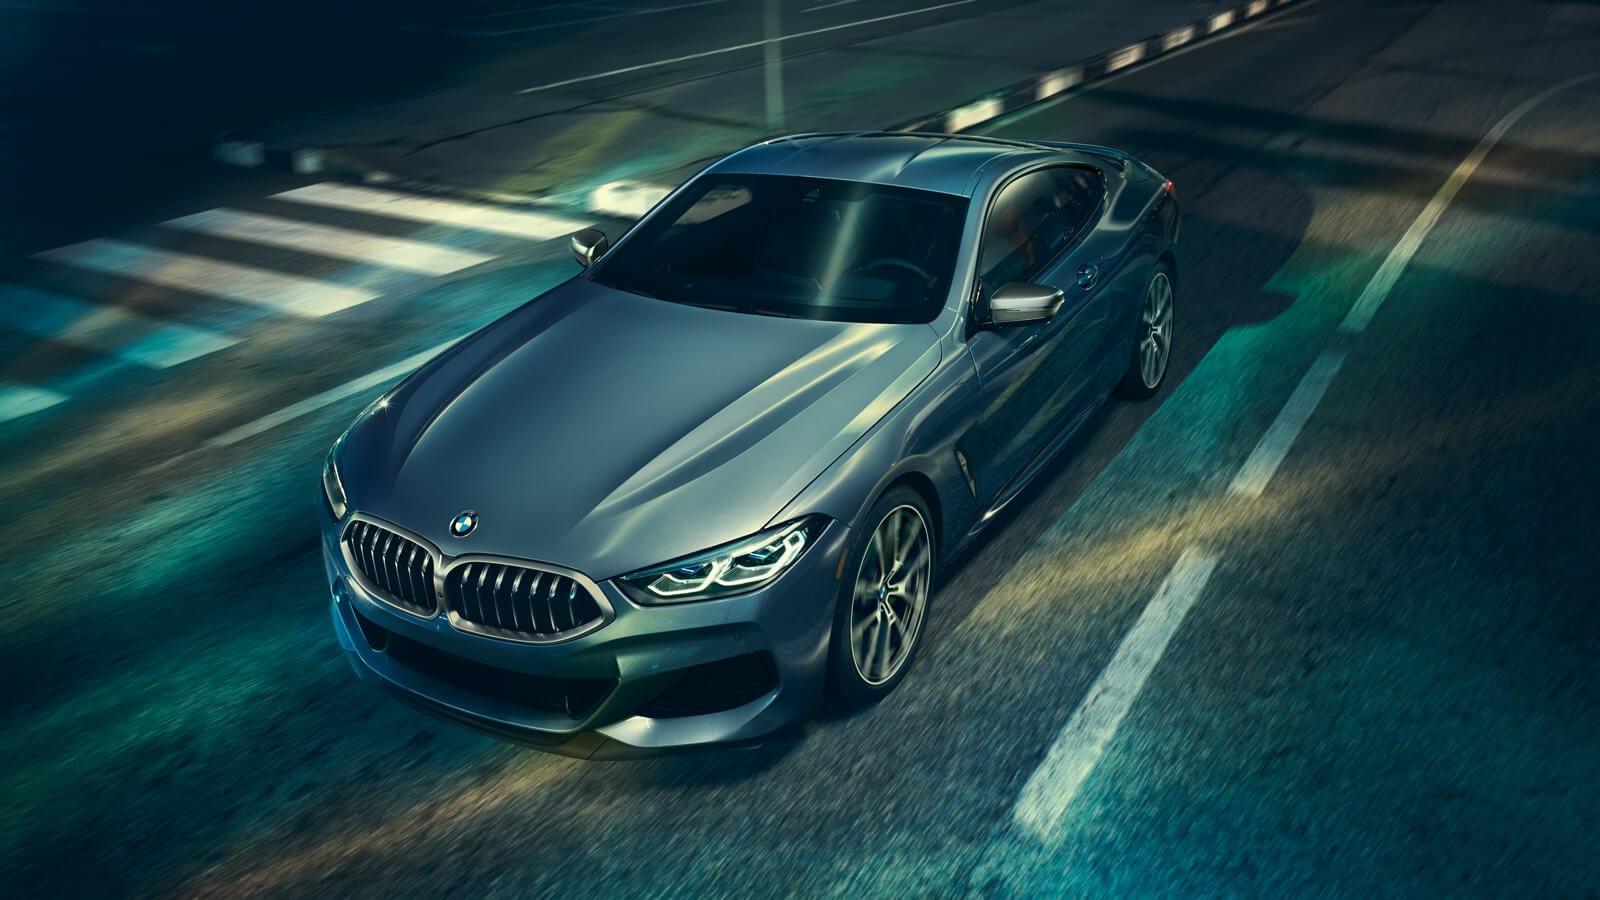 2019 BMW M850xi Sedan *Must have BMW loyalty